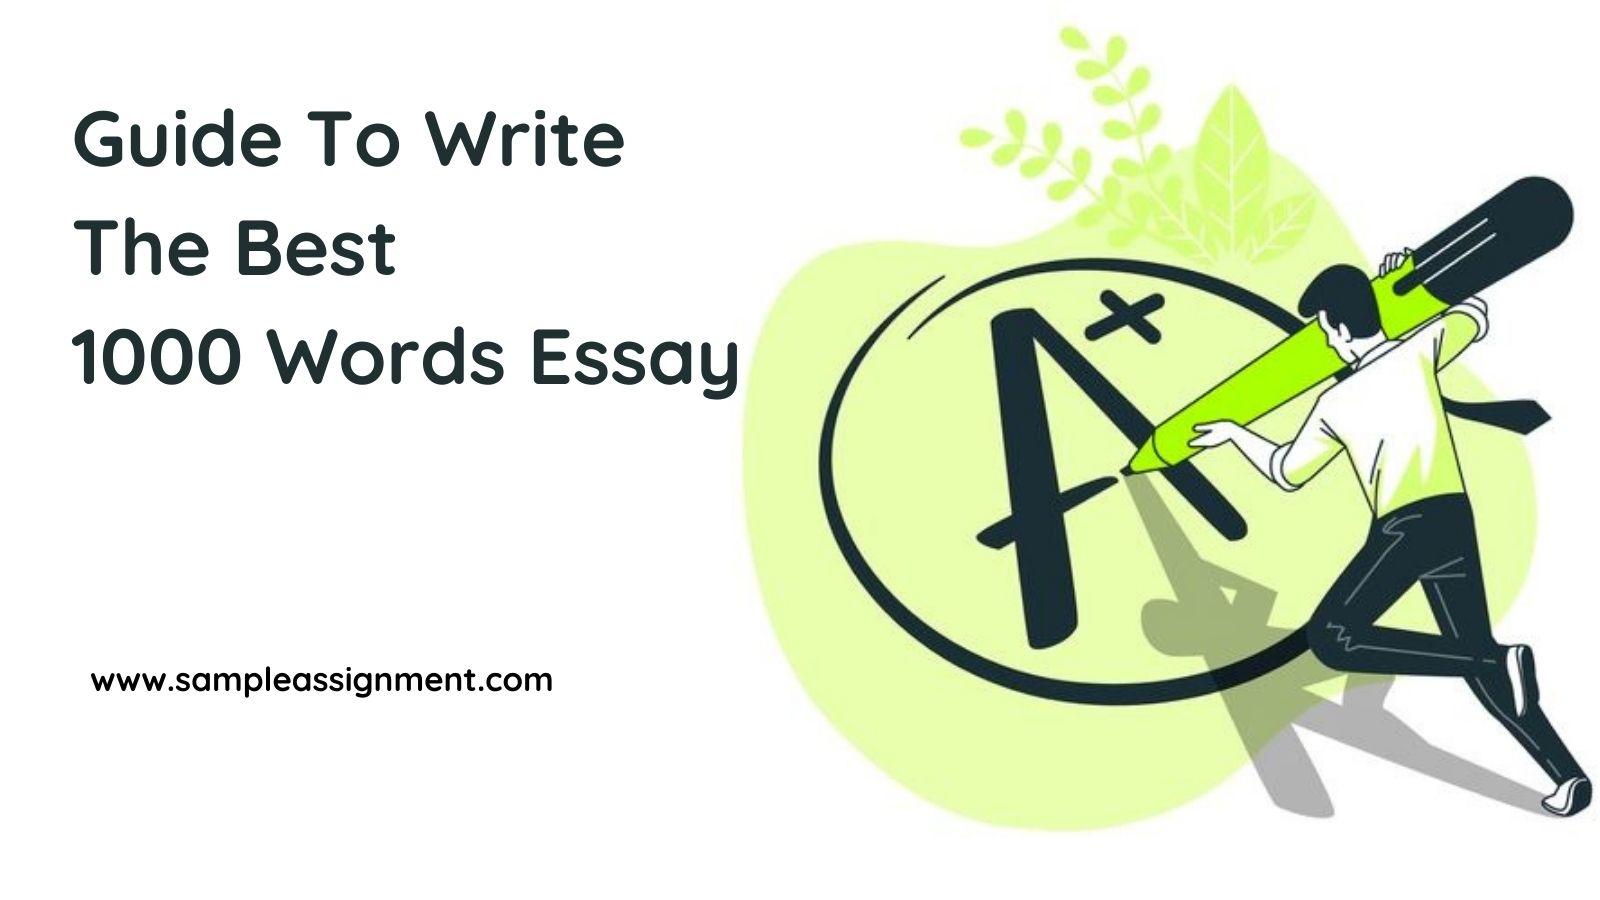 1000 words essay writing help